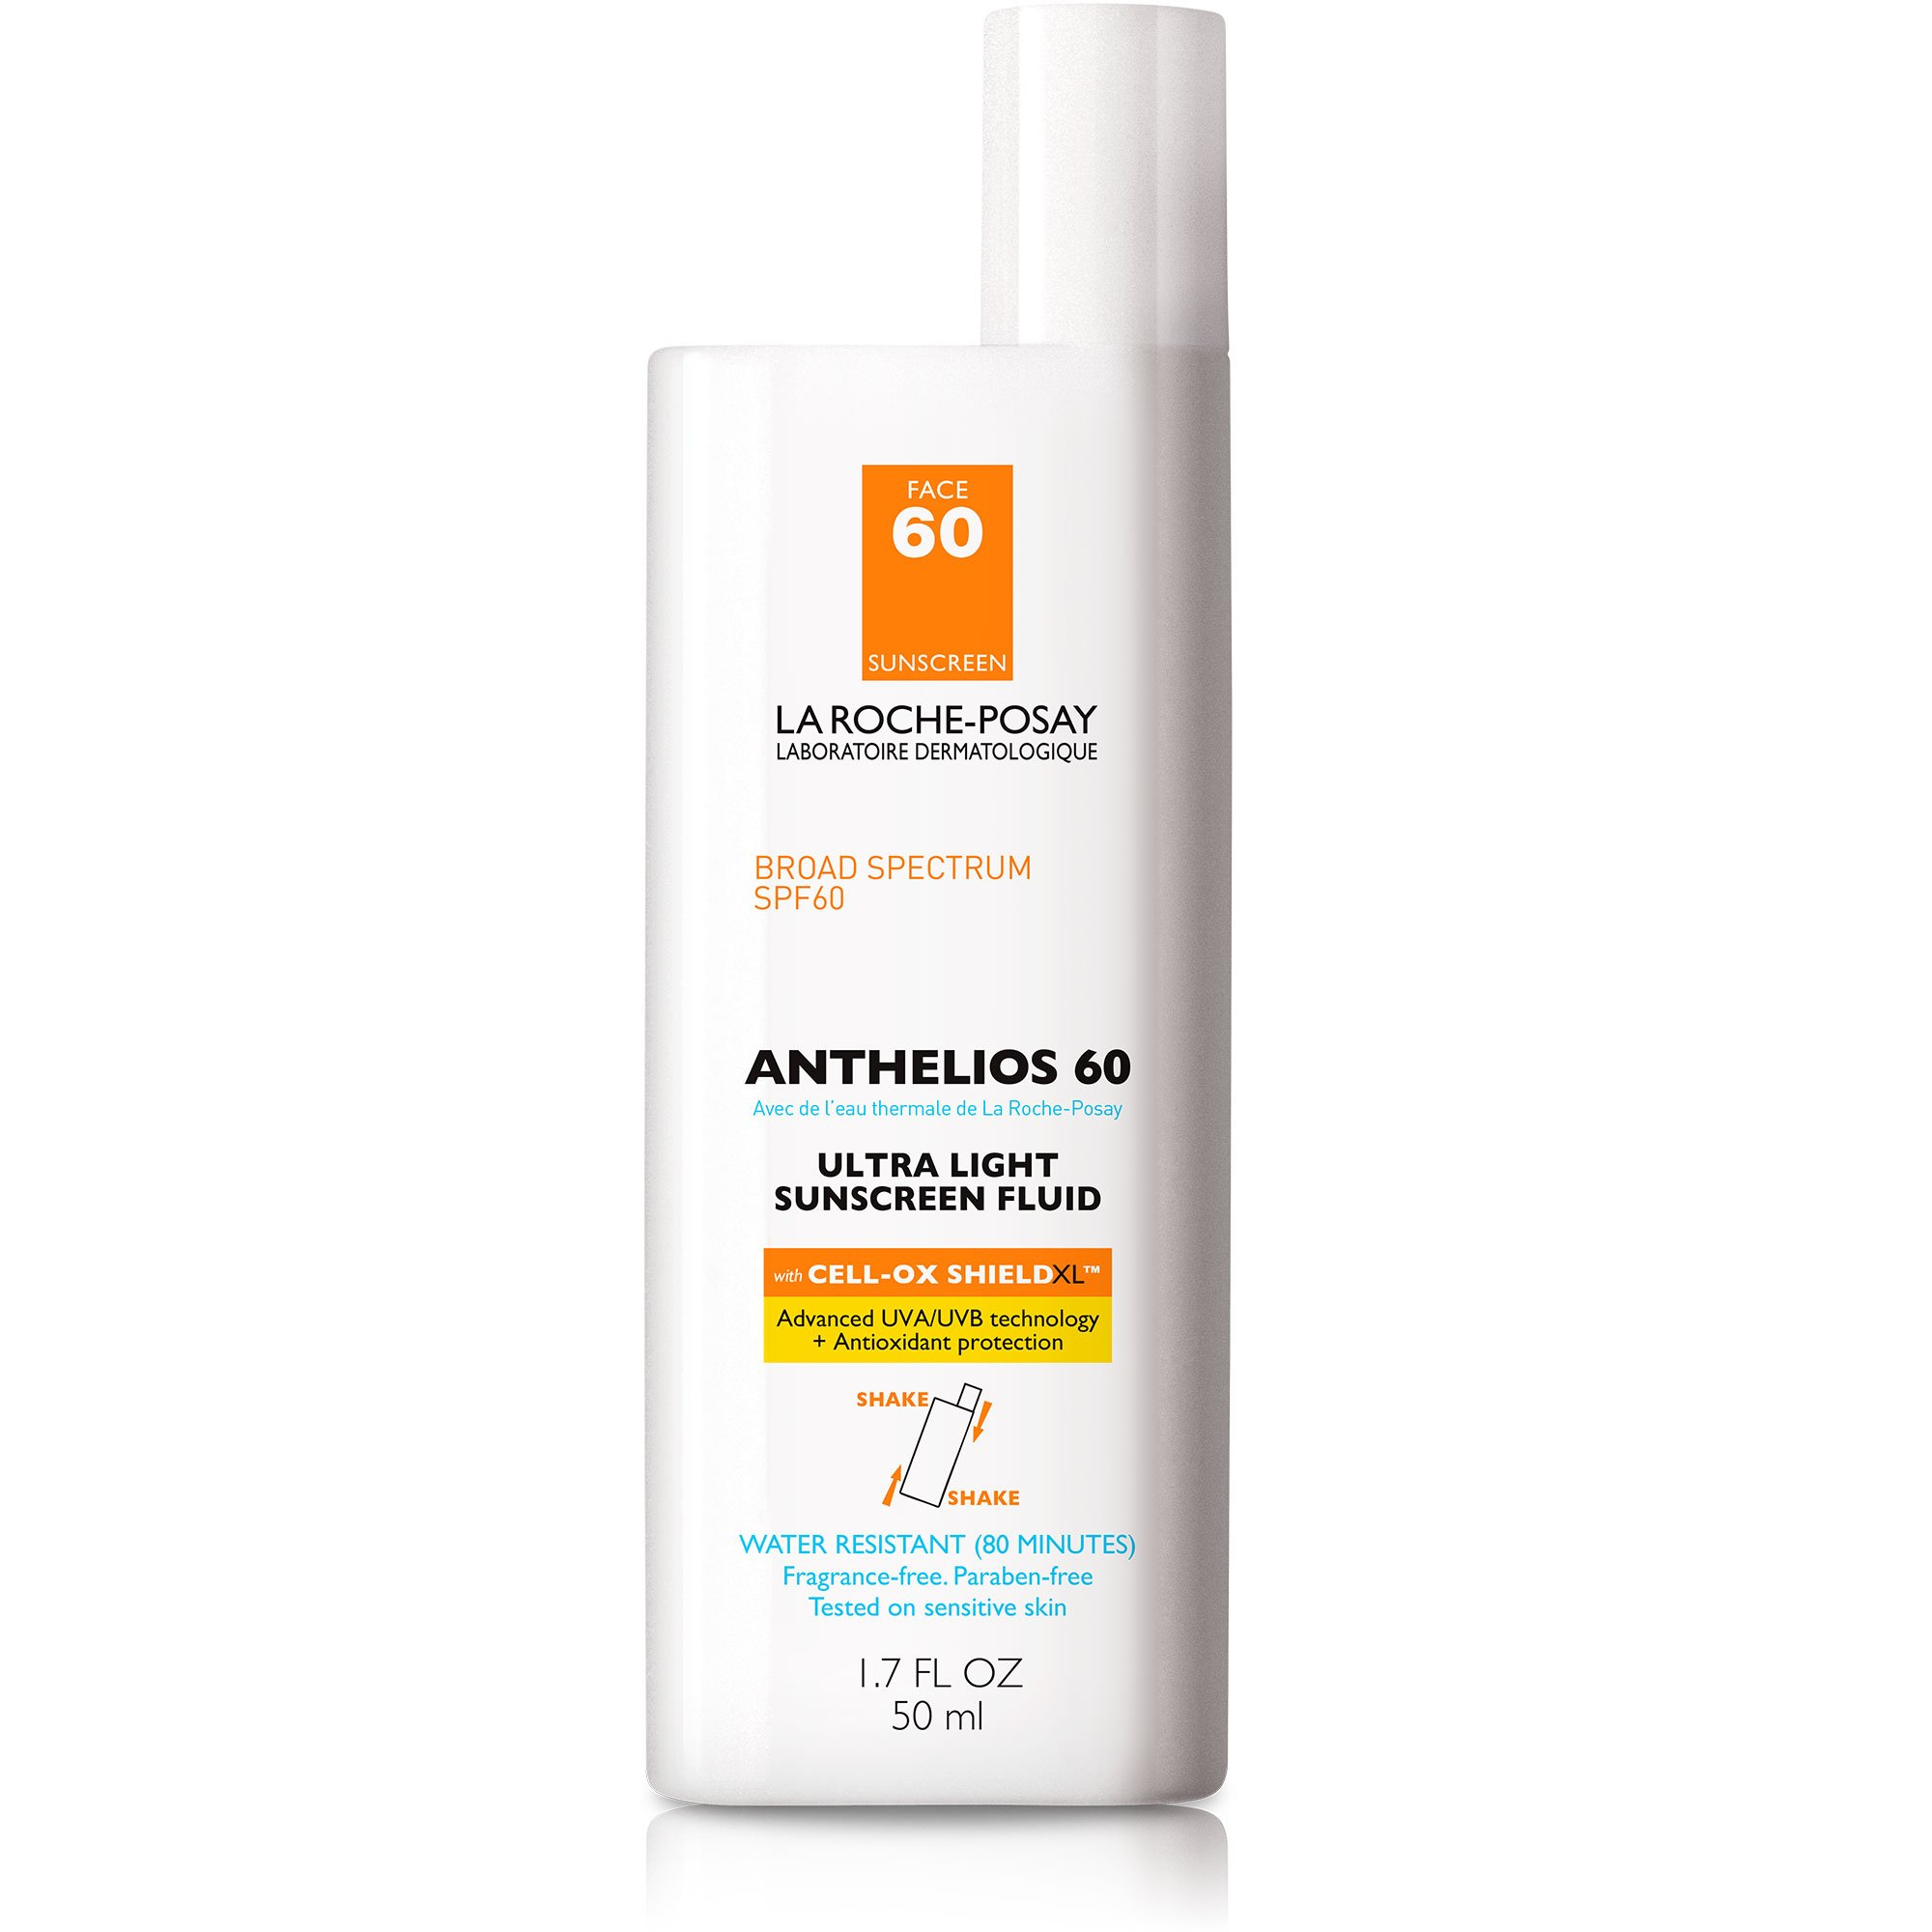 La Roche-Posay Anthelios Ultra Light Sunscreen Fluid SPF 60, 1.7 Fl. Oz.